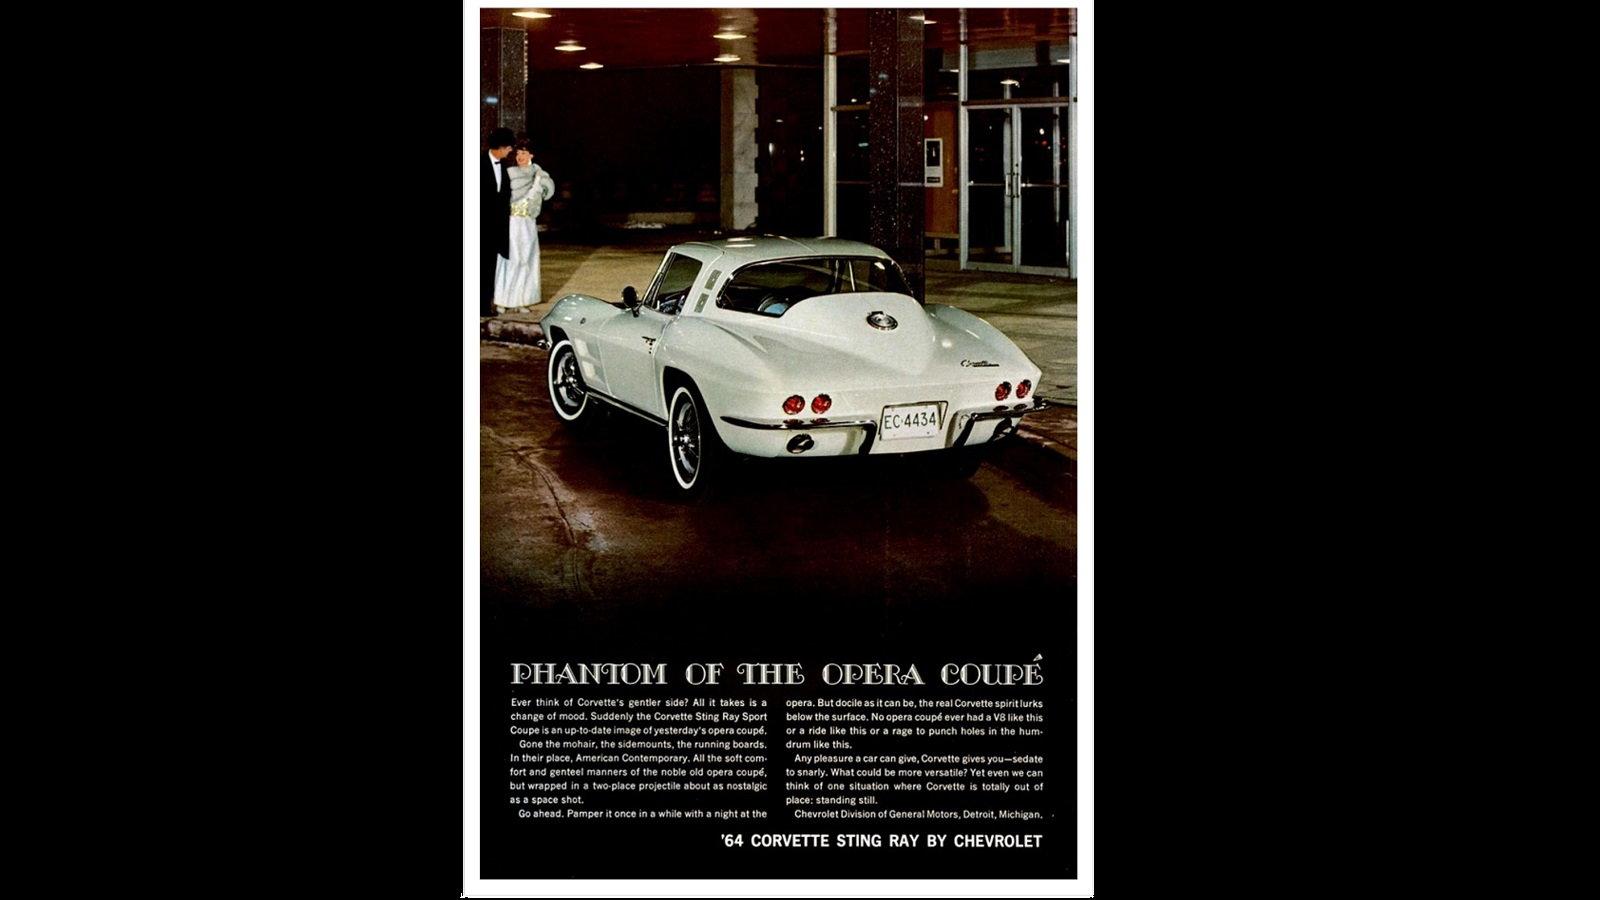 Phantom of the Opera Coupe